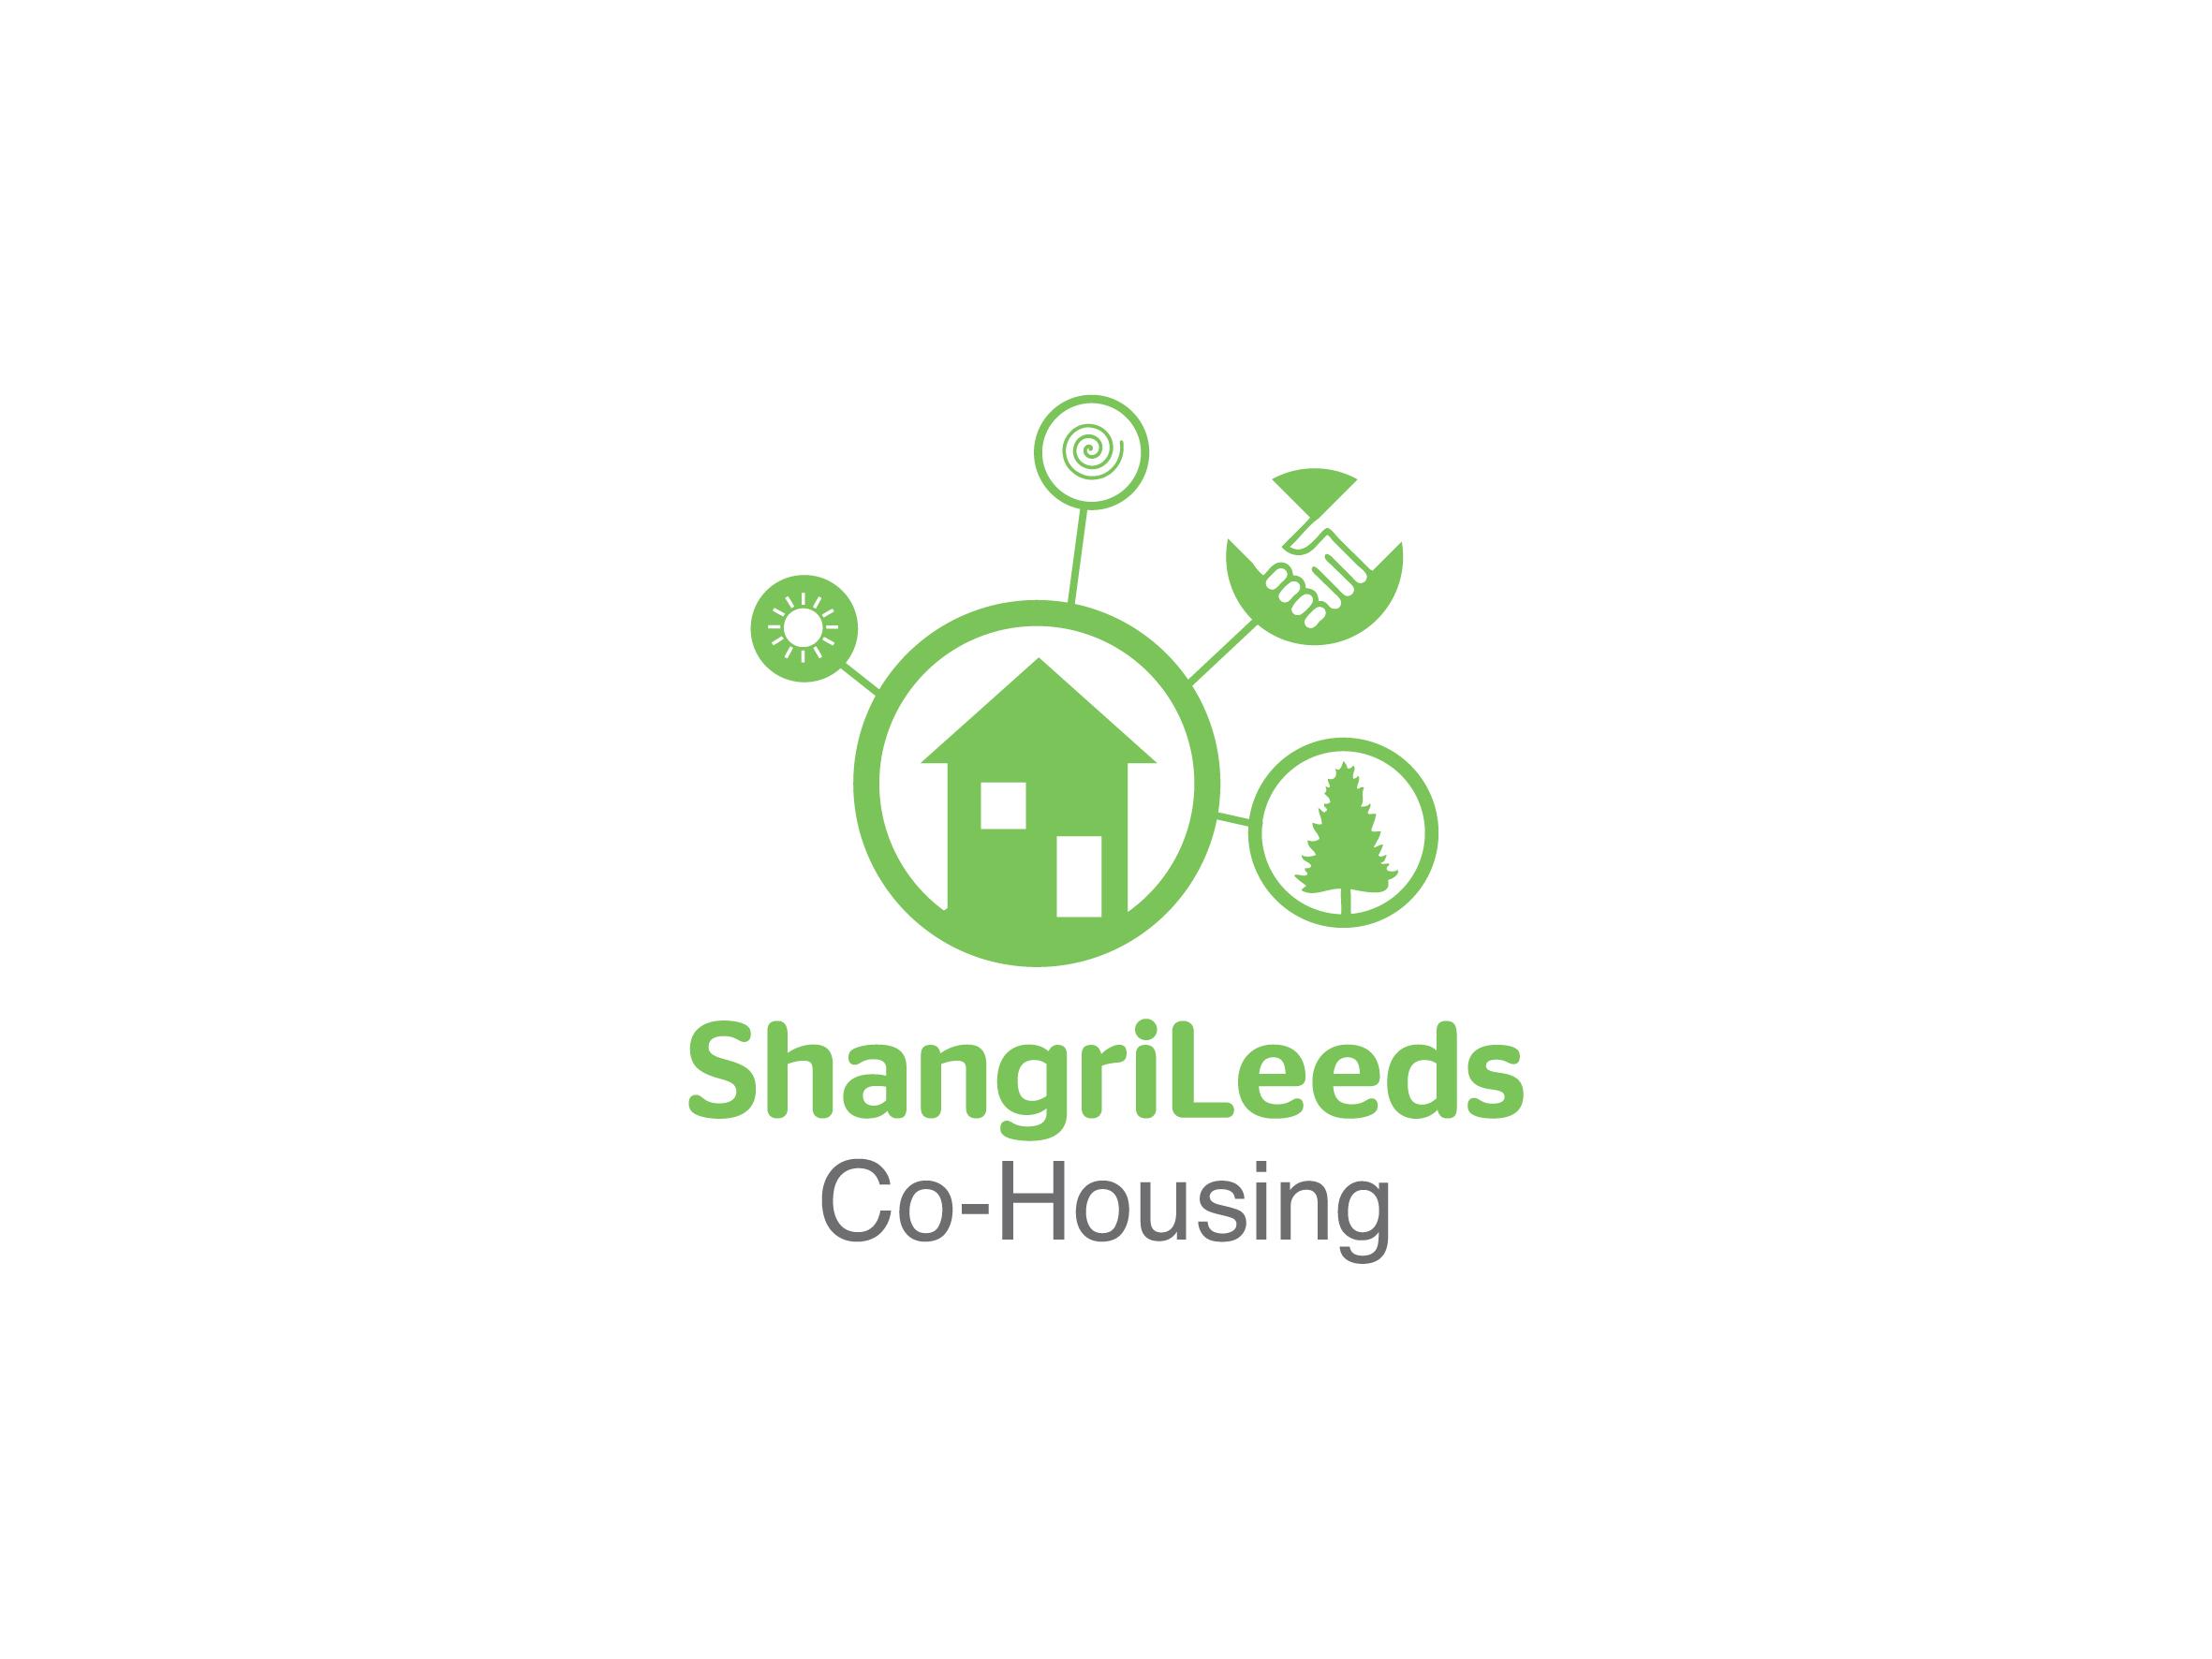 shangrileeds co-housing project leeds logo design designed by Dakini Design Saltaire, Shipley, Bradford